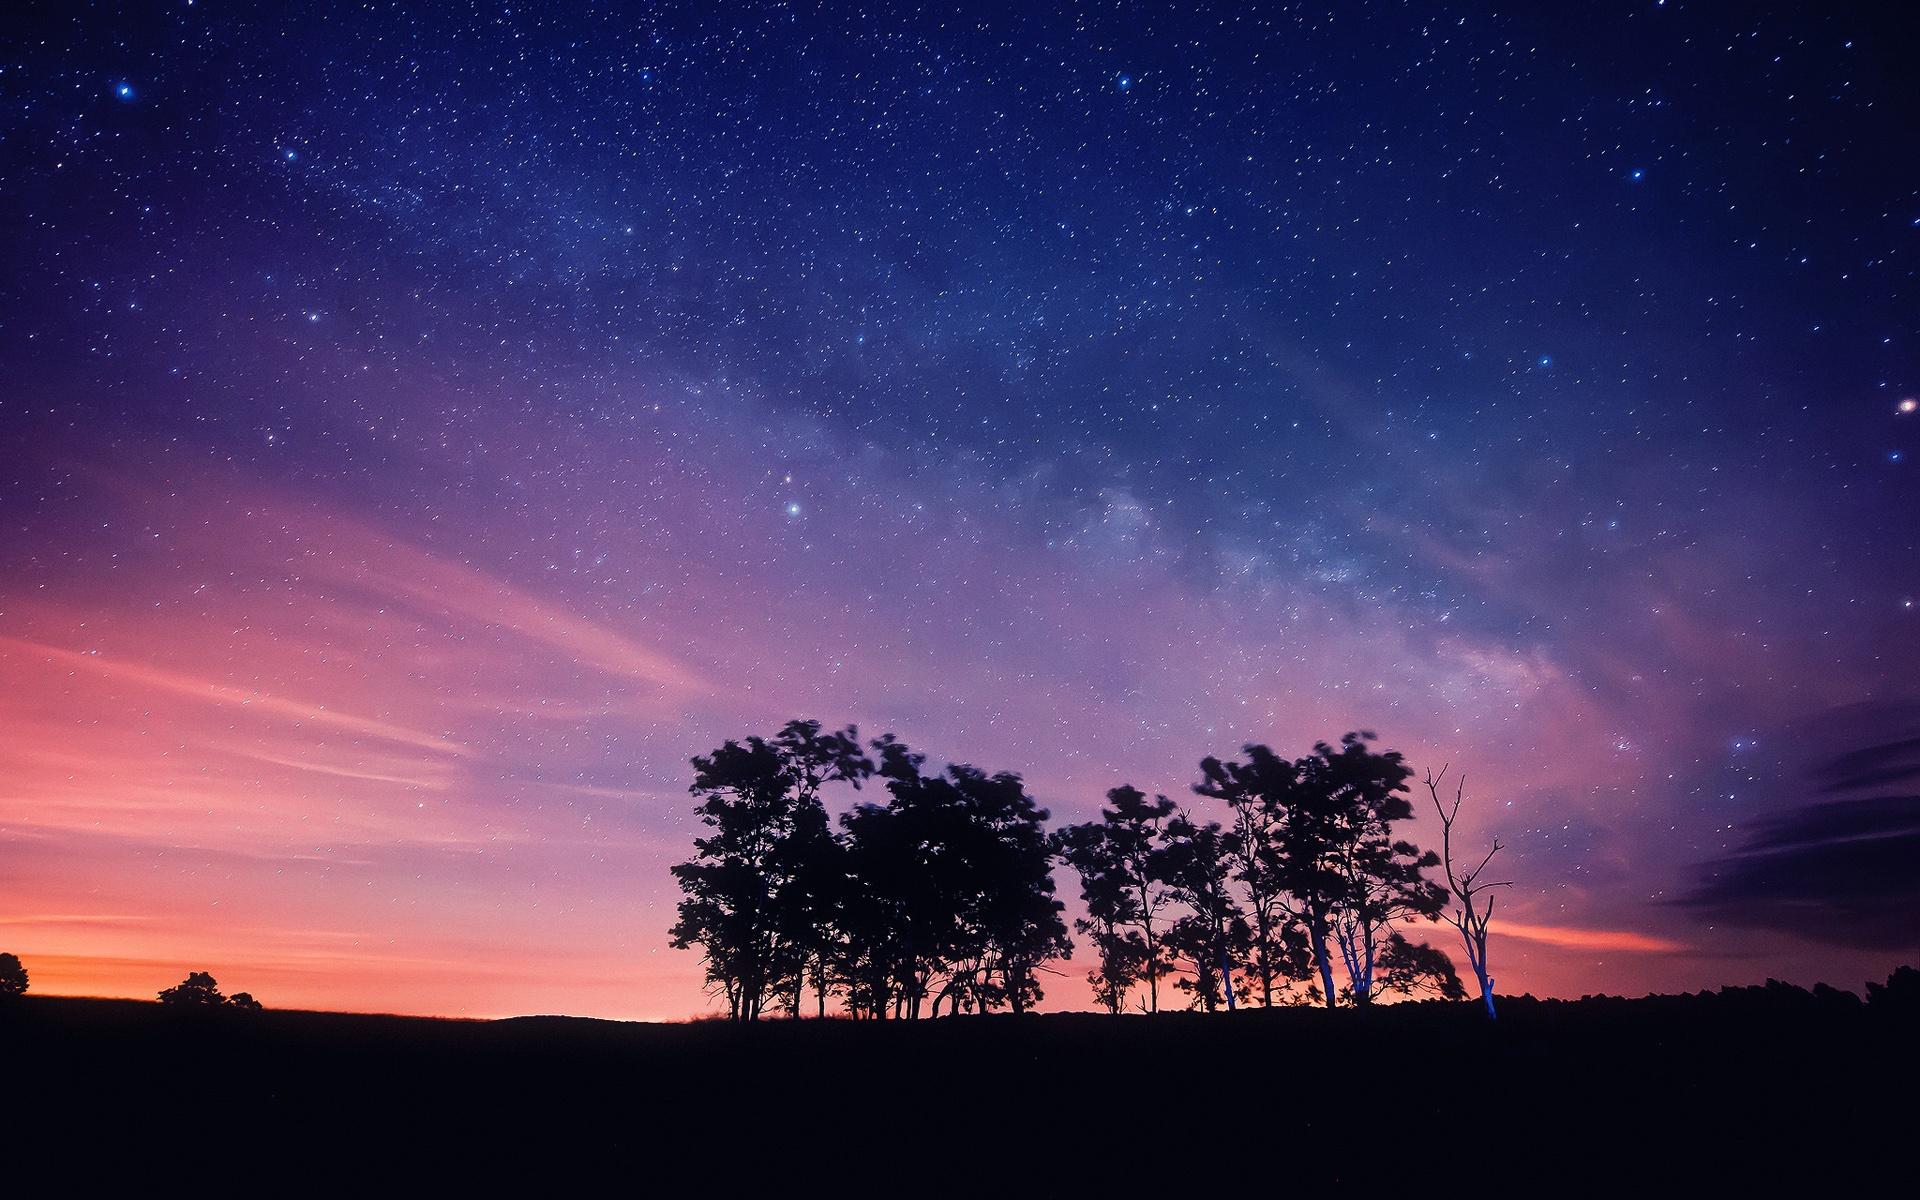 Булавками, картинки неба звезды